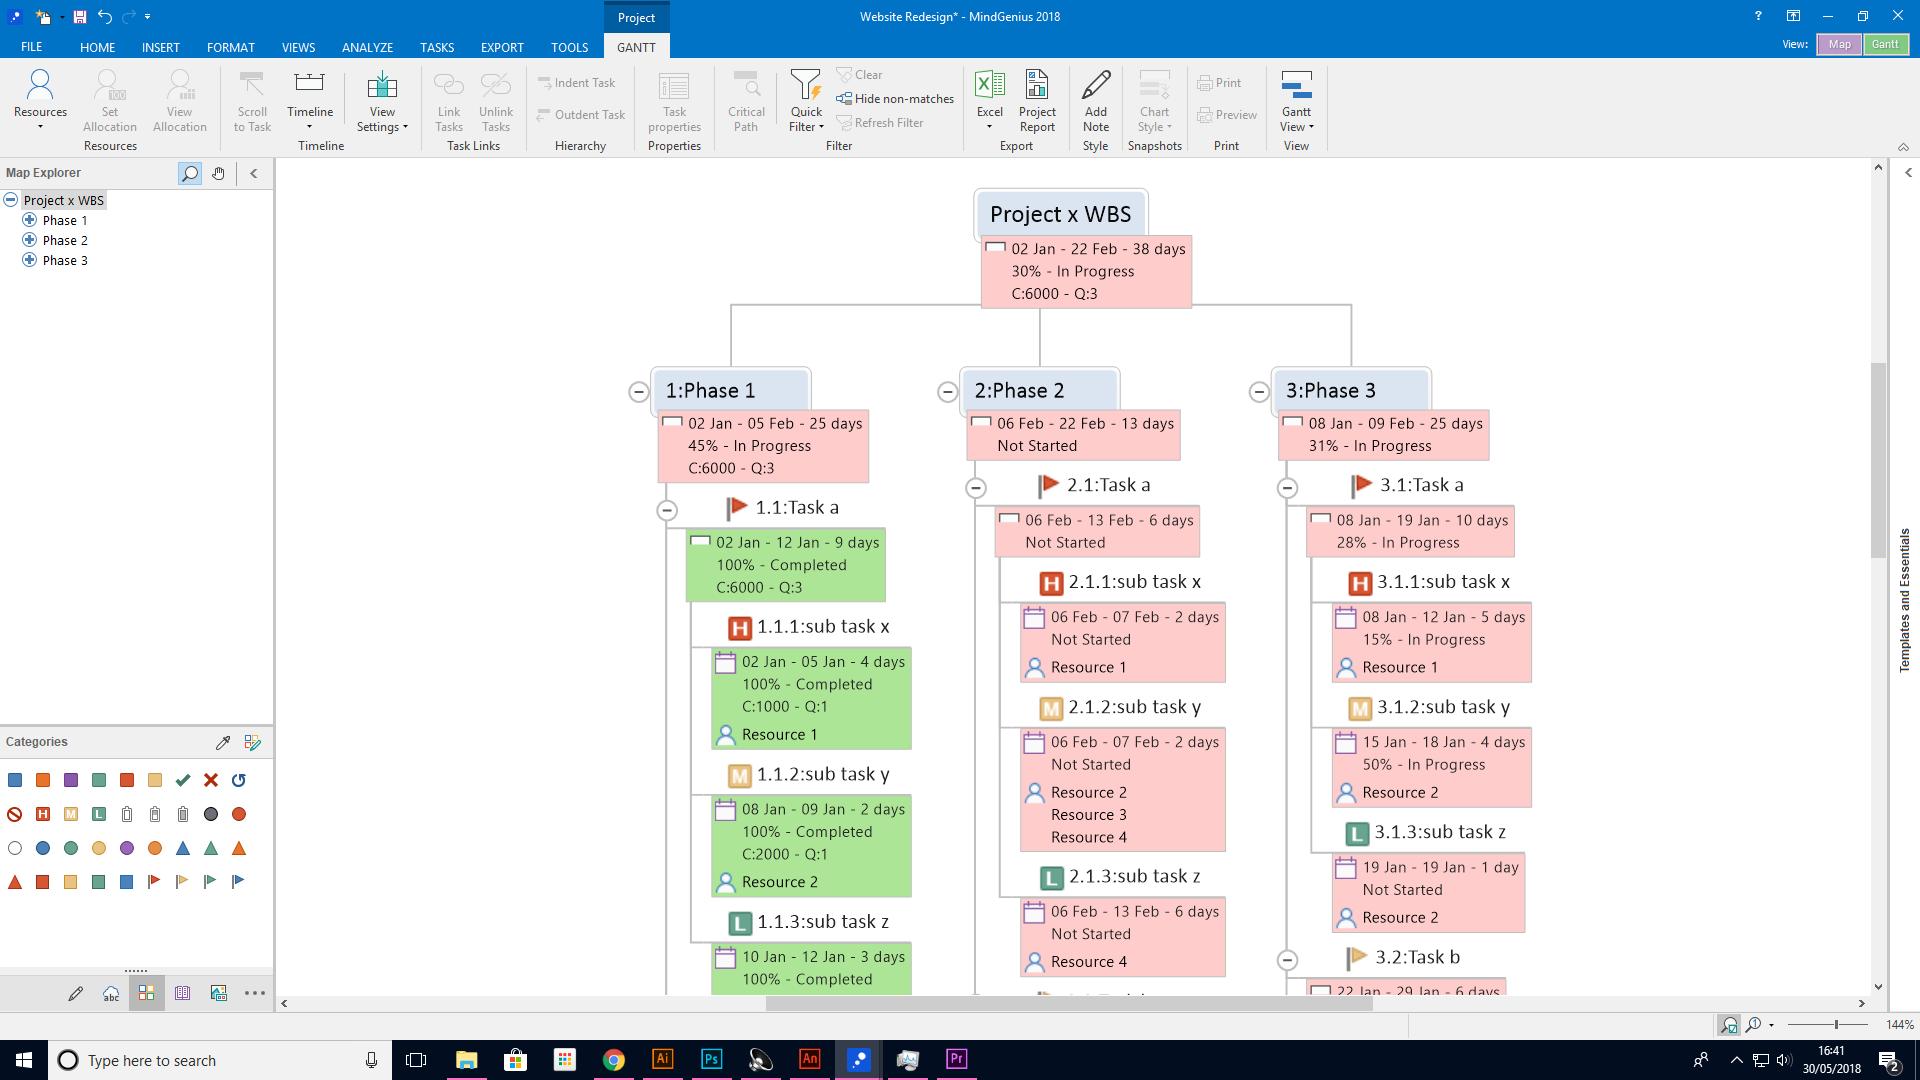 MindGenius Software - Map explorer